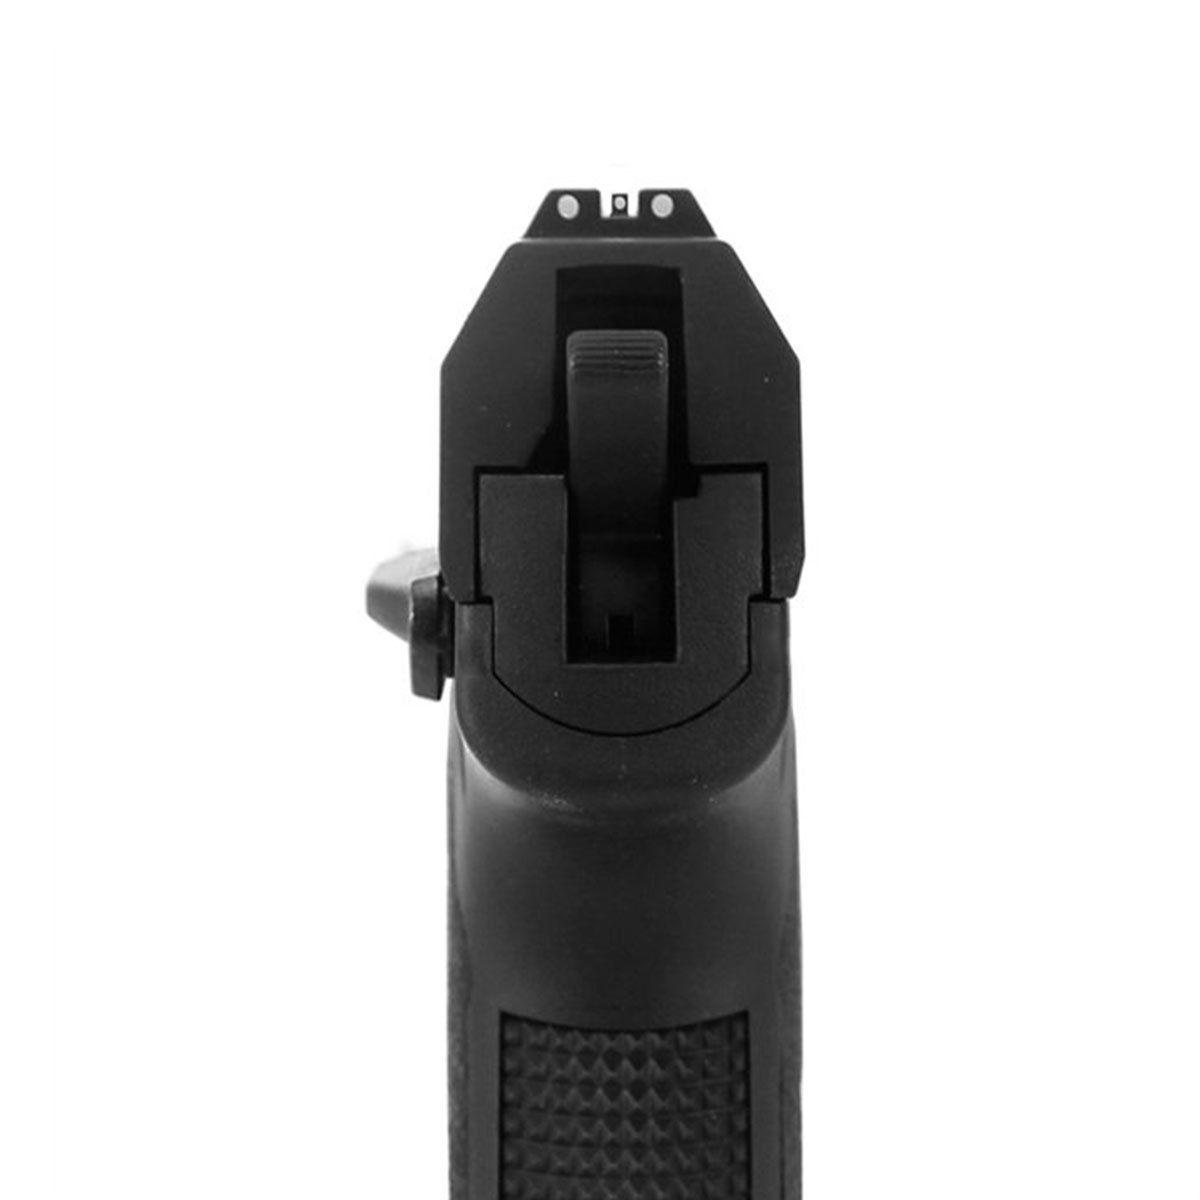 Pistola Airsoft CYMA USP CM.125 Slide Metal Elétrica Bivolt